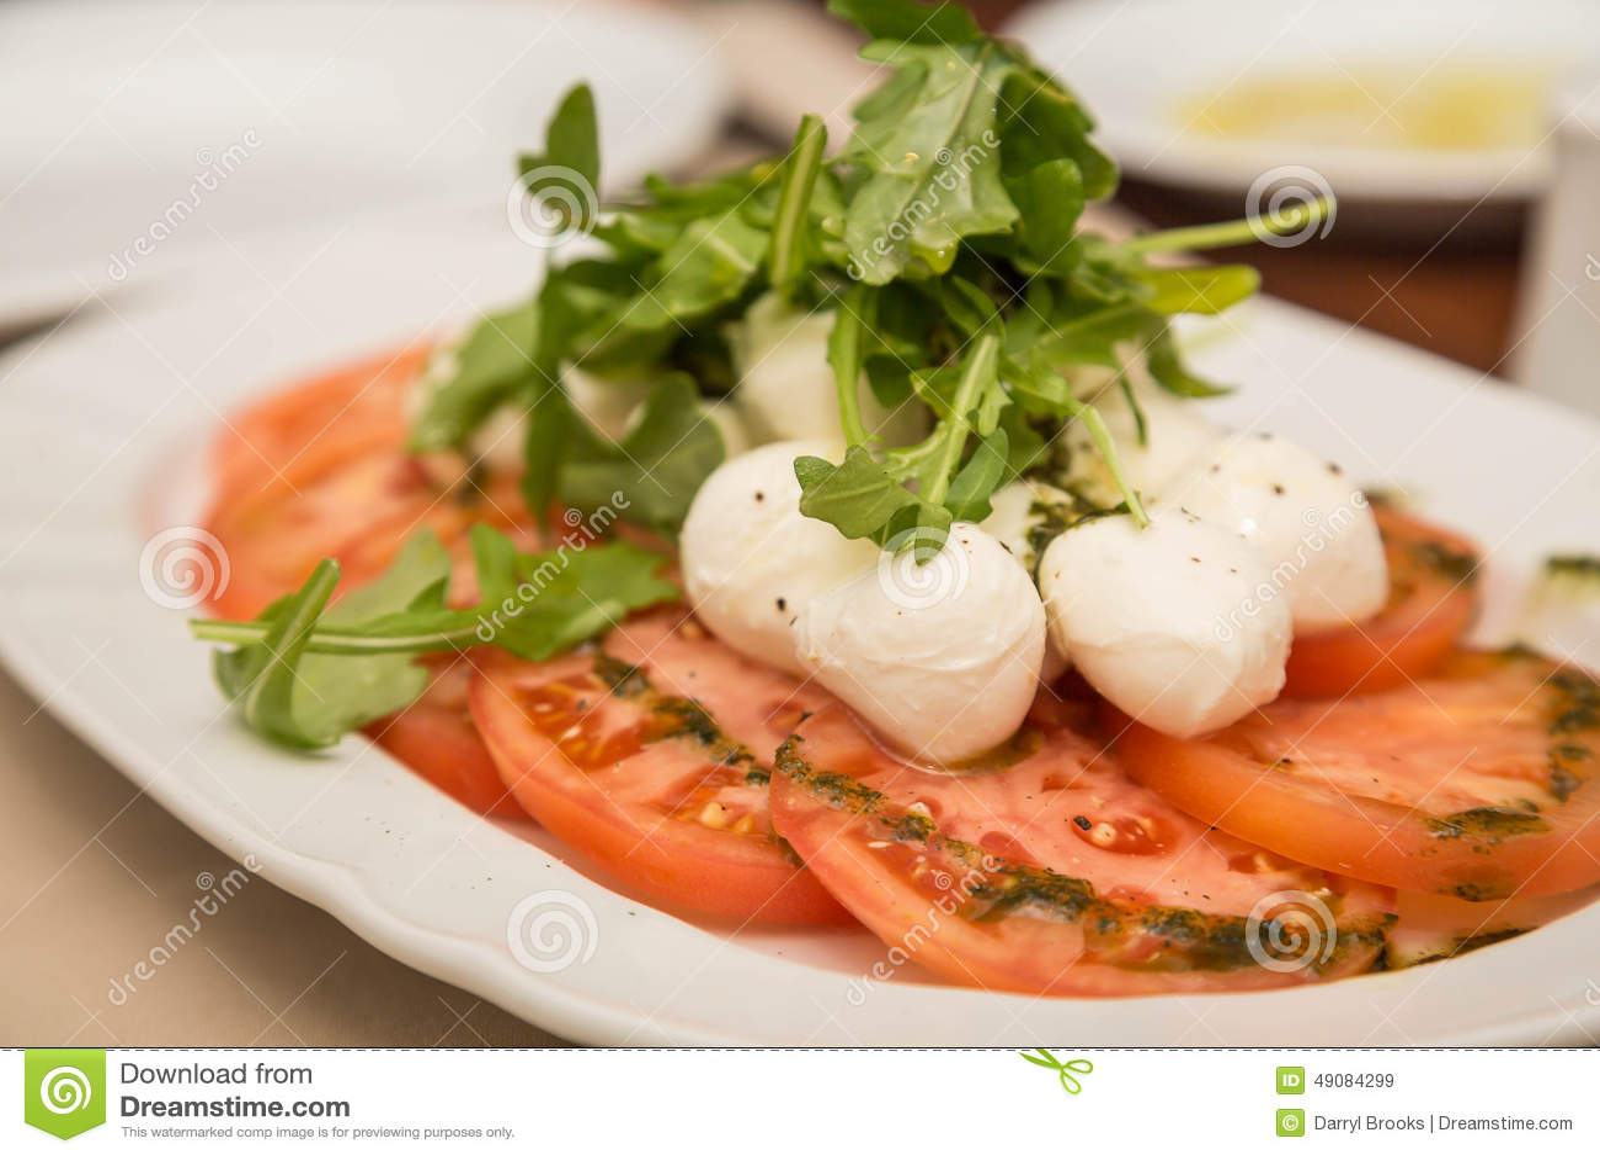 Tomatoes Mozzarella And Arugula Stock Photo - Image: 49084299